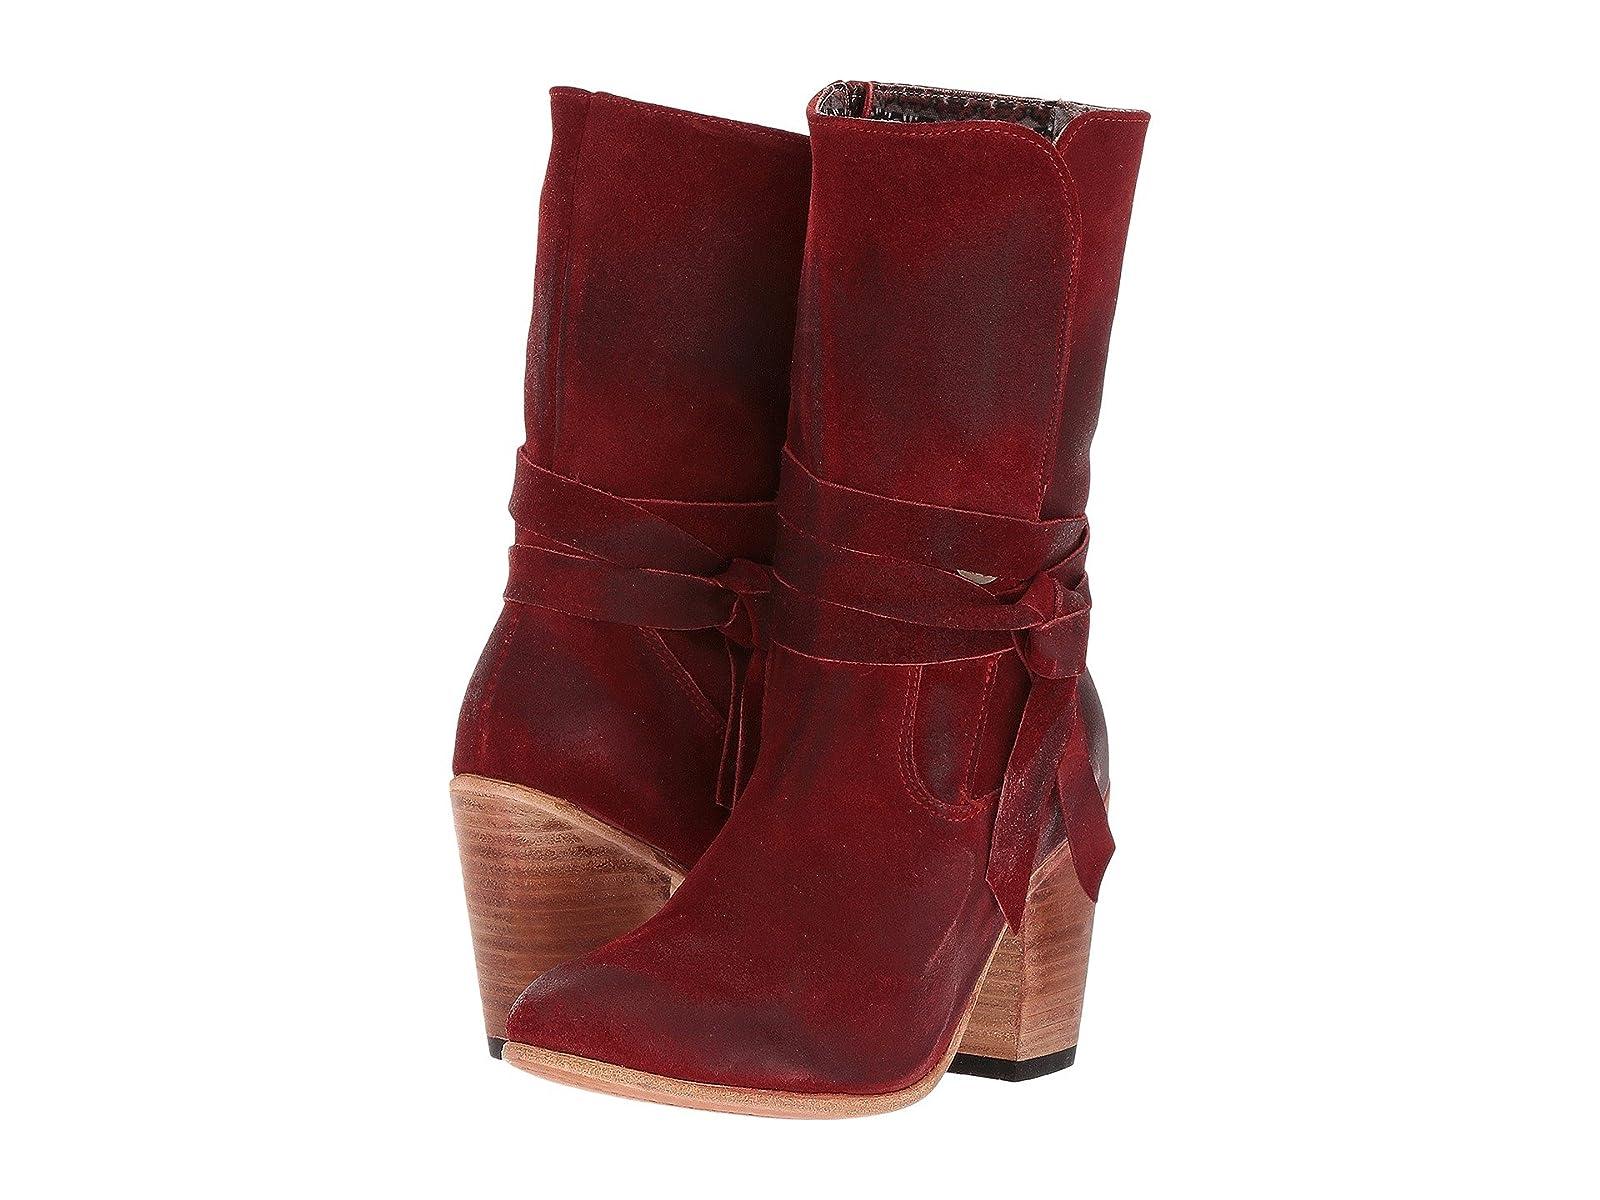 Freebird RiotCheap and distinctive eye-catching shoes